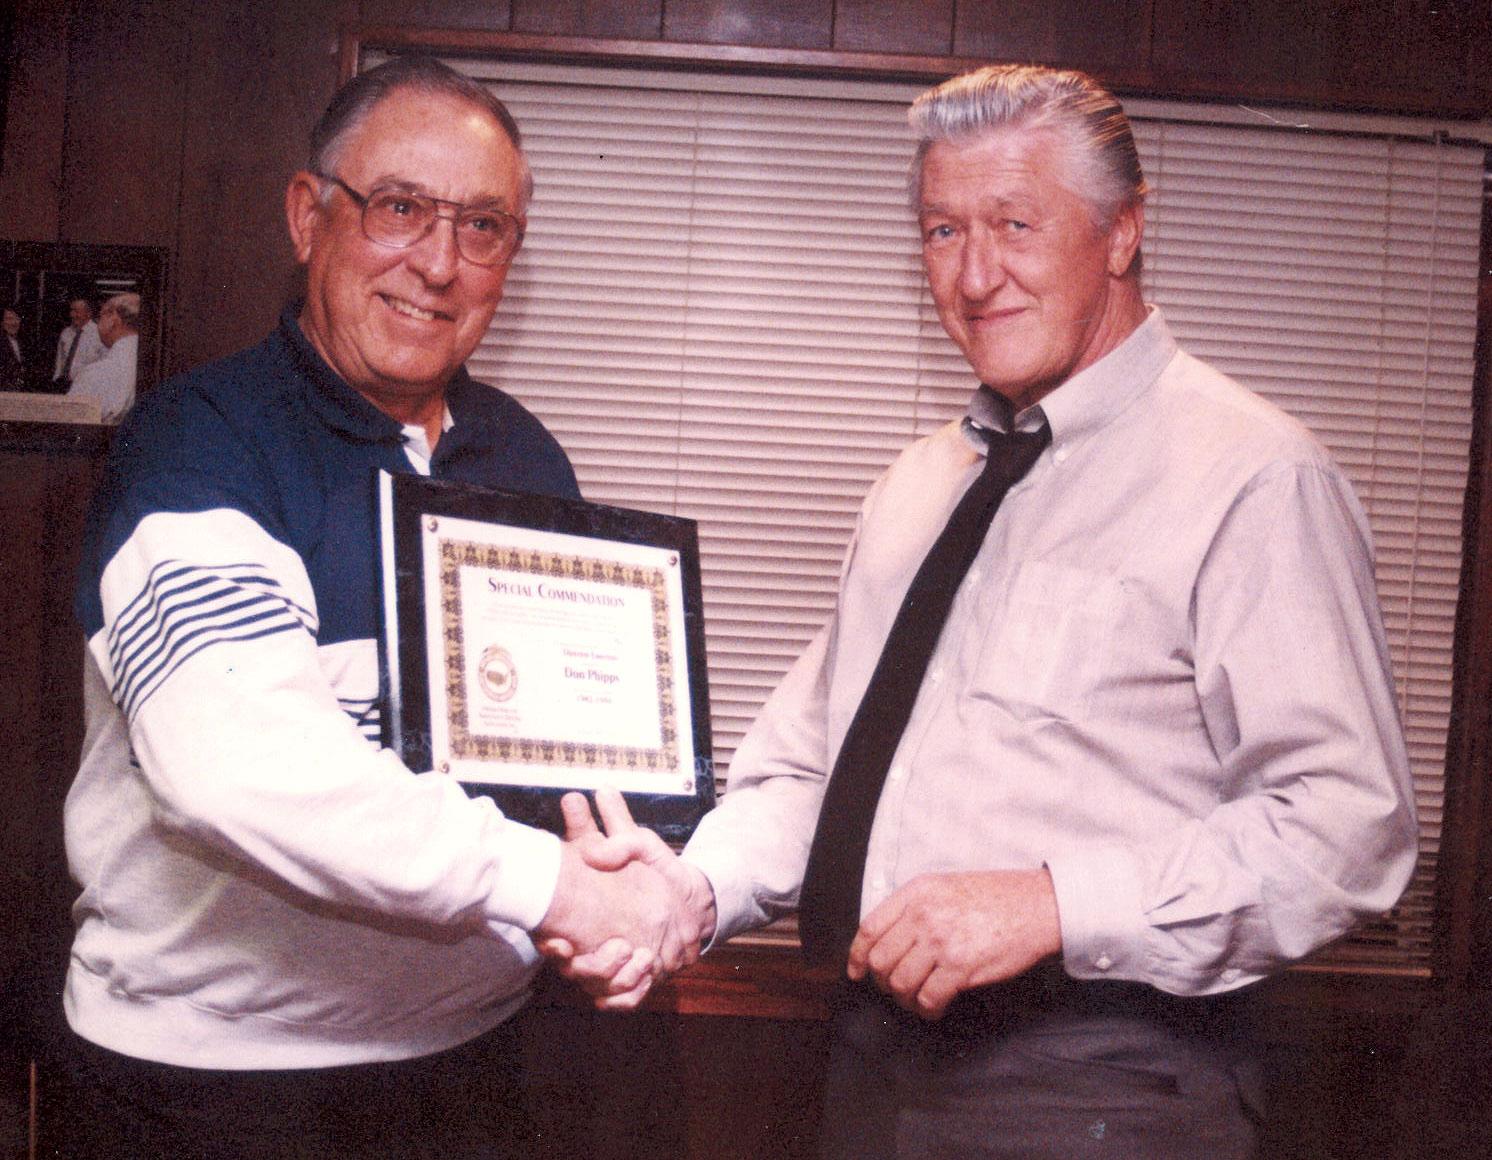 Don Phipps (left) and Jim Johnston